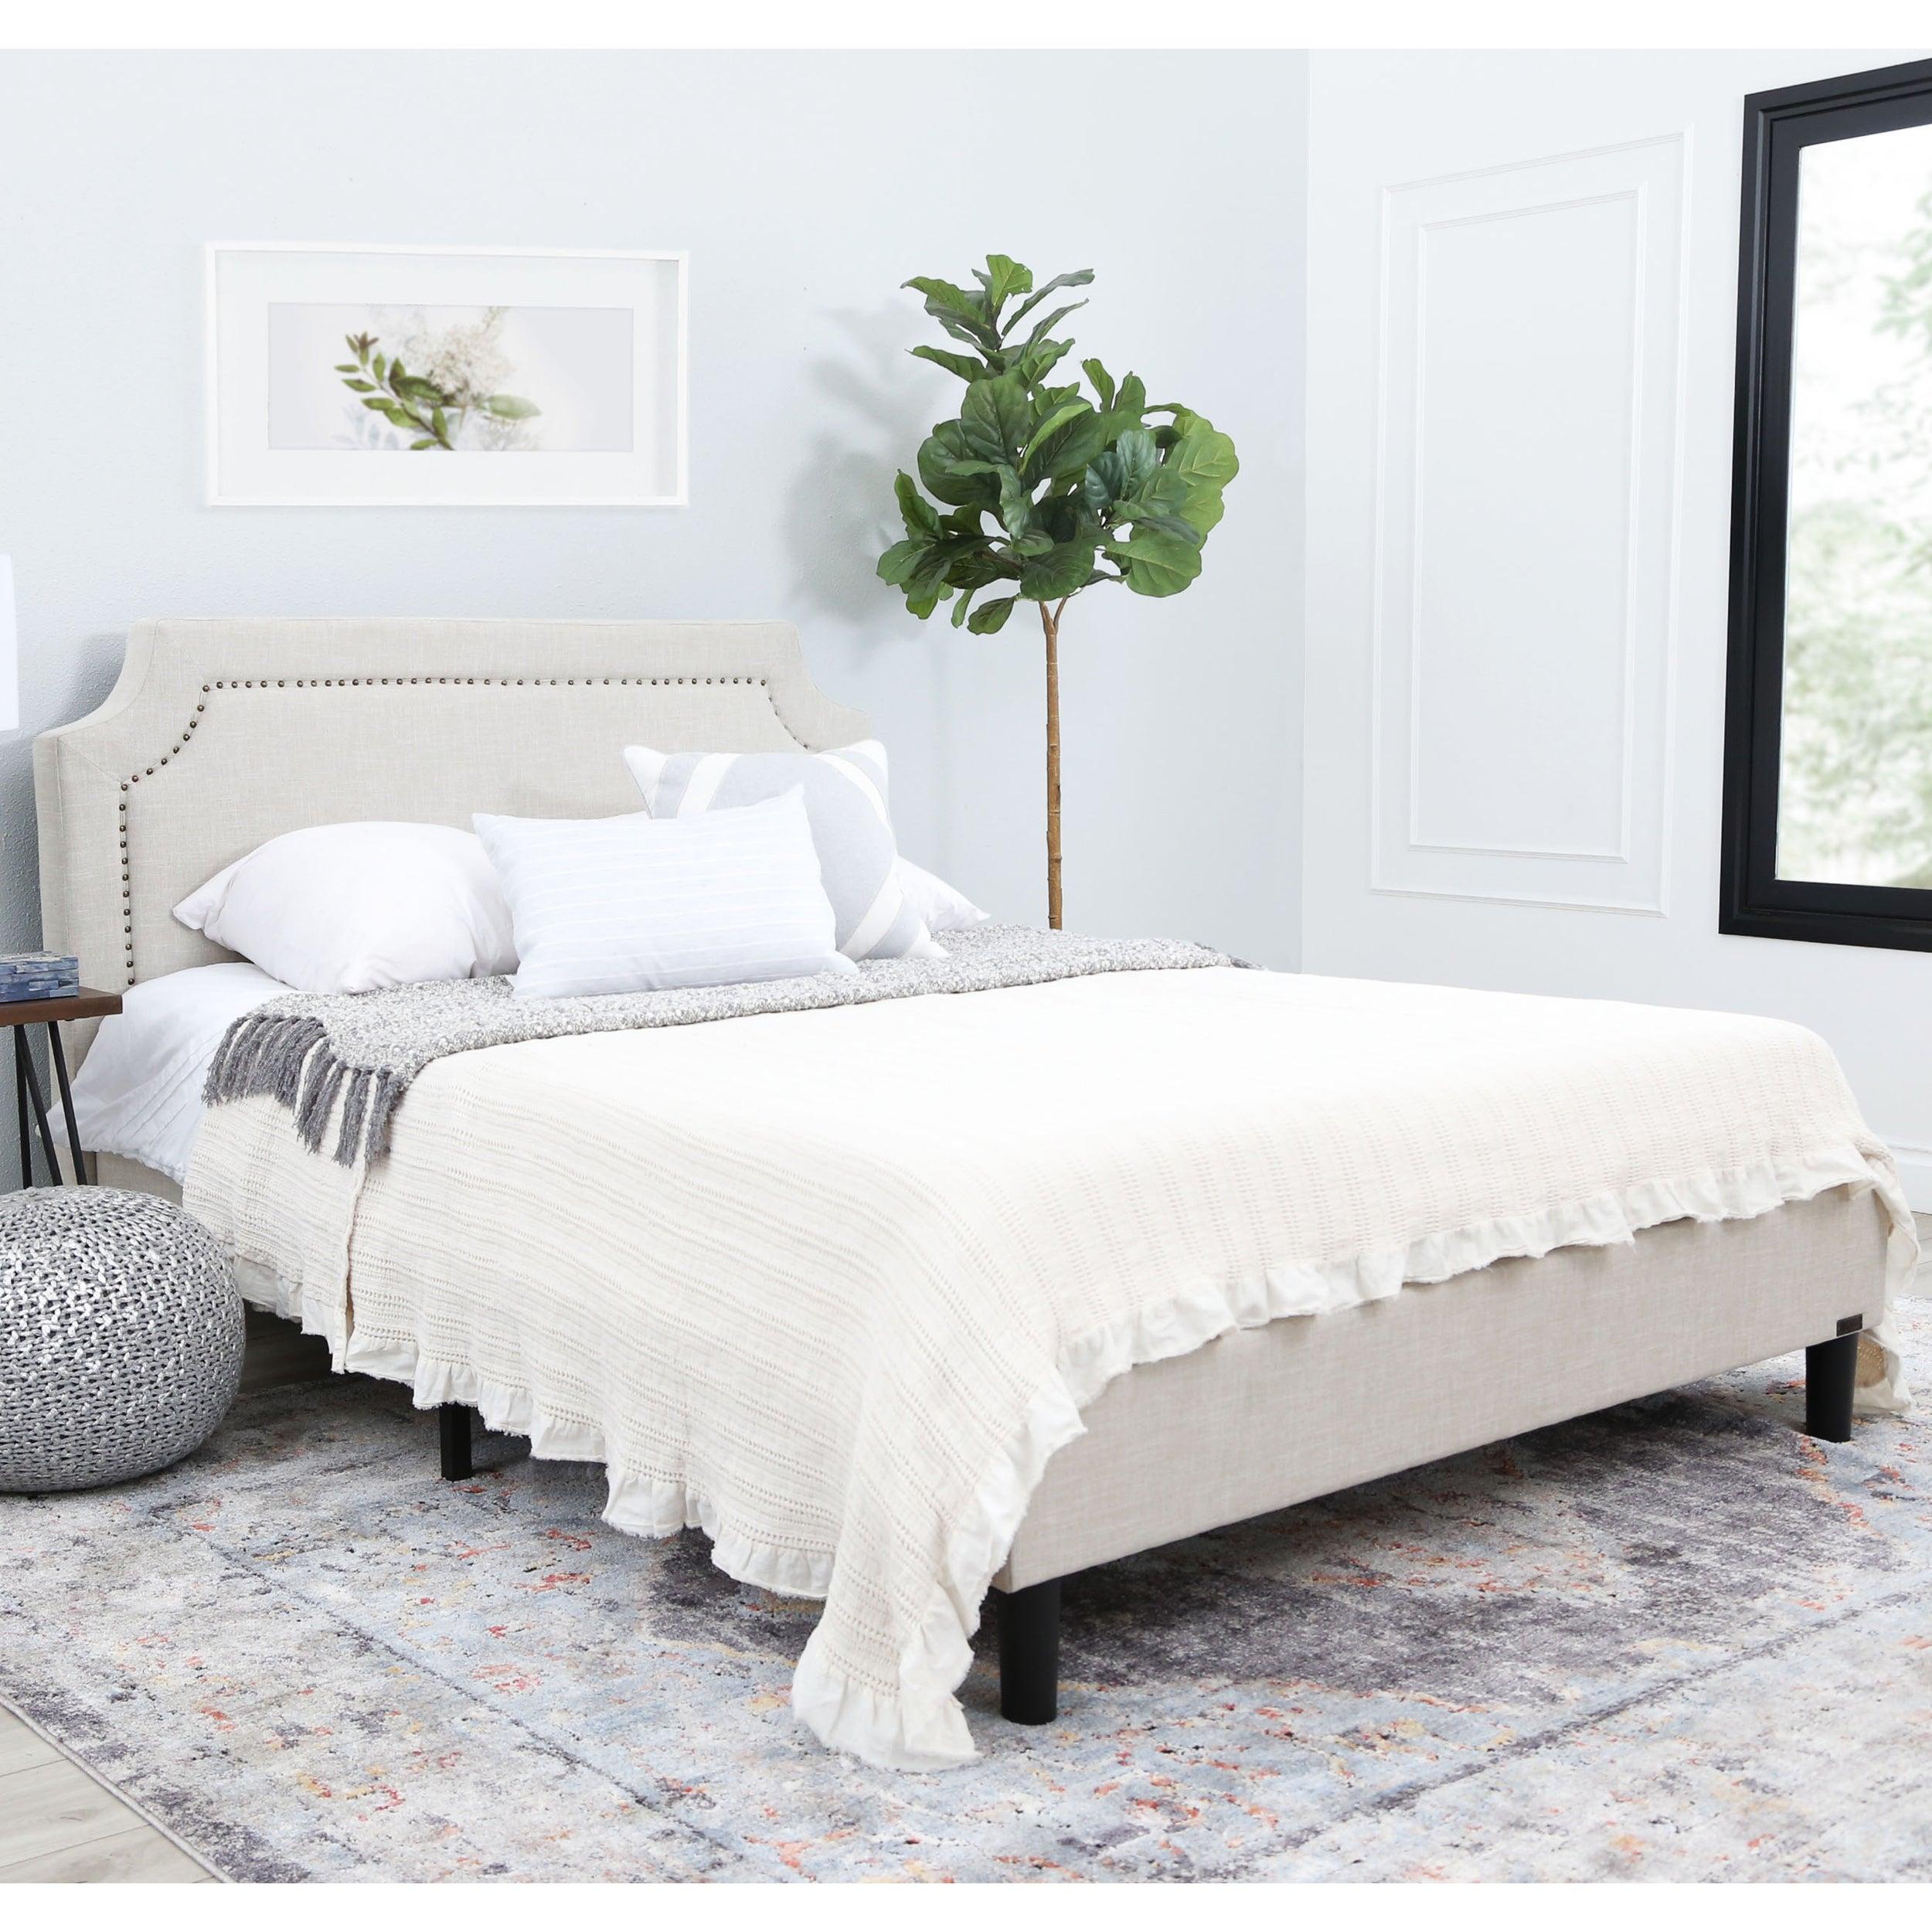 Abbyson Allegro Cream Upholstered Queen Platform Bed